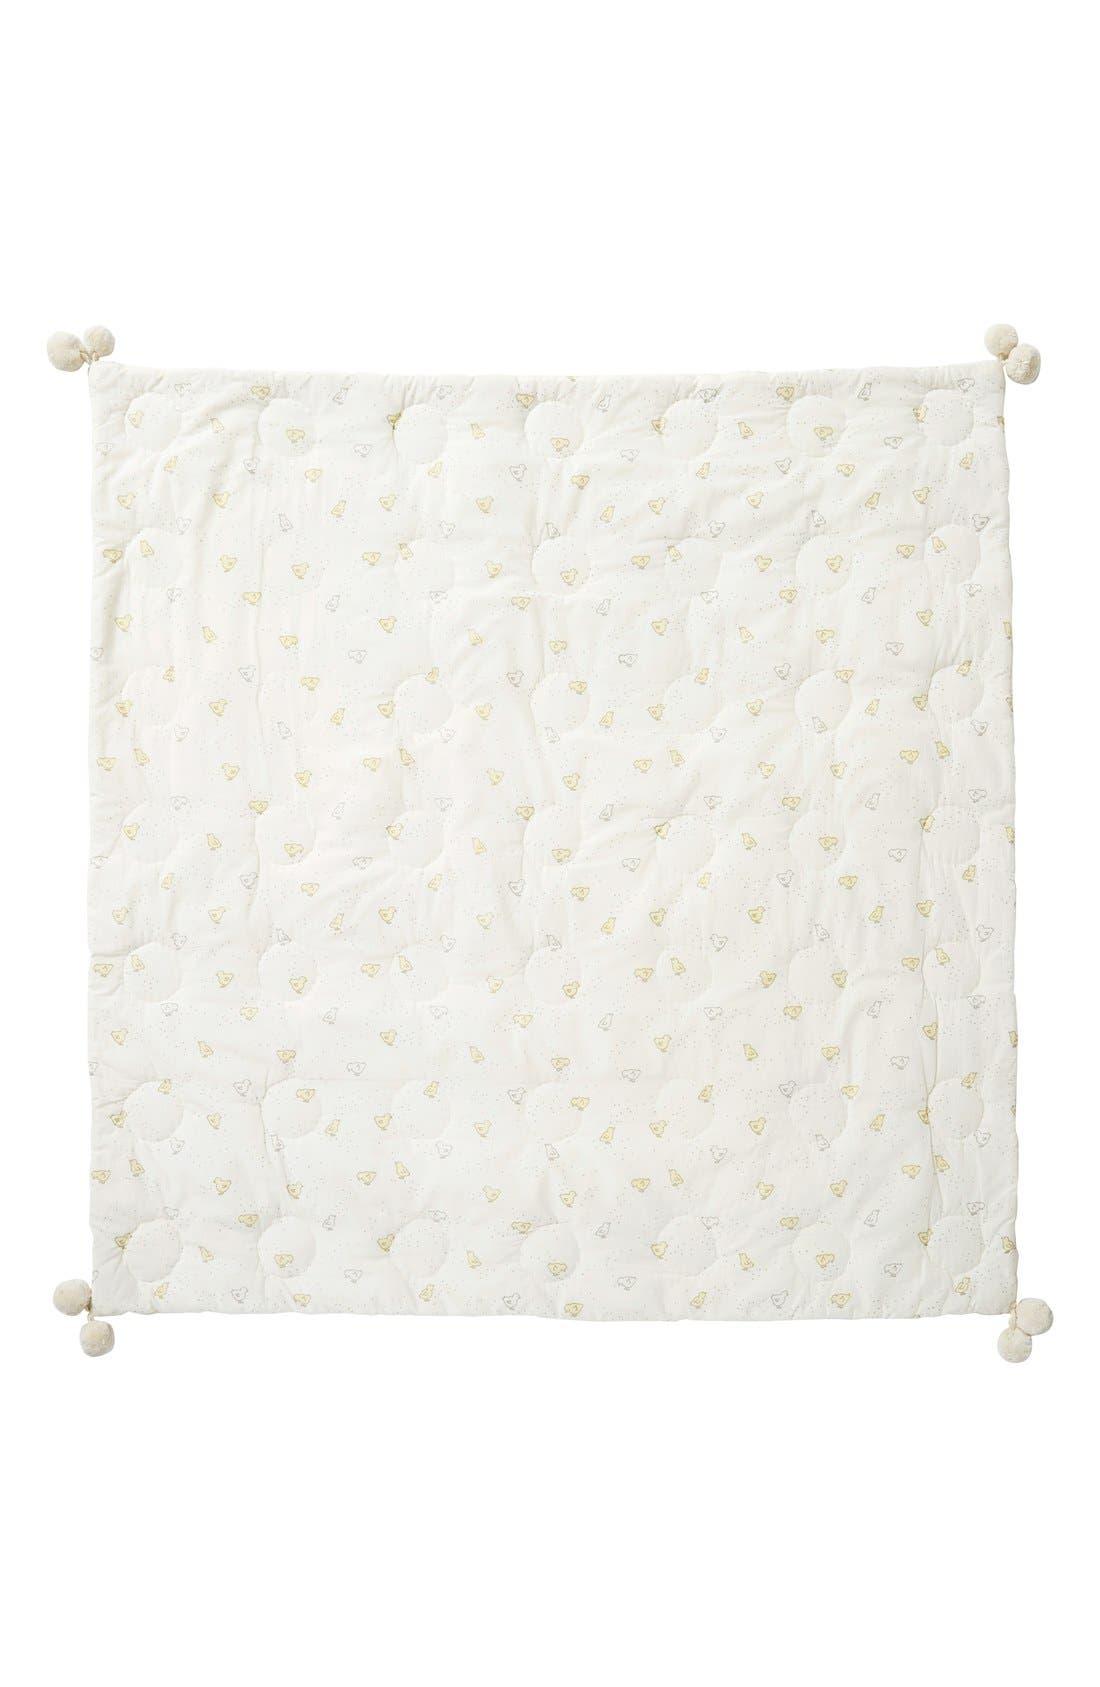 Petit Pehr 'Baby Chick' Baby Blanket